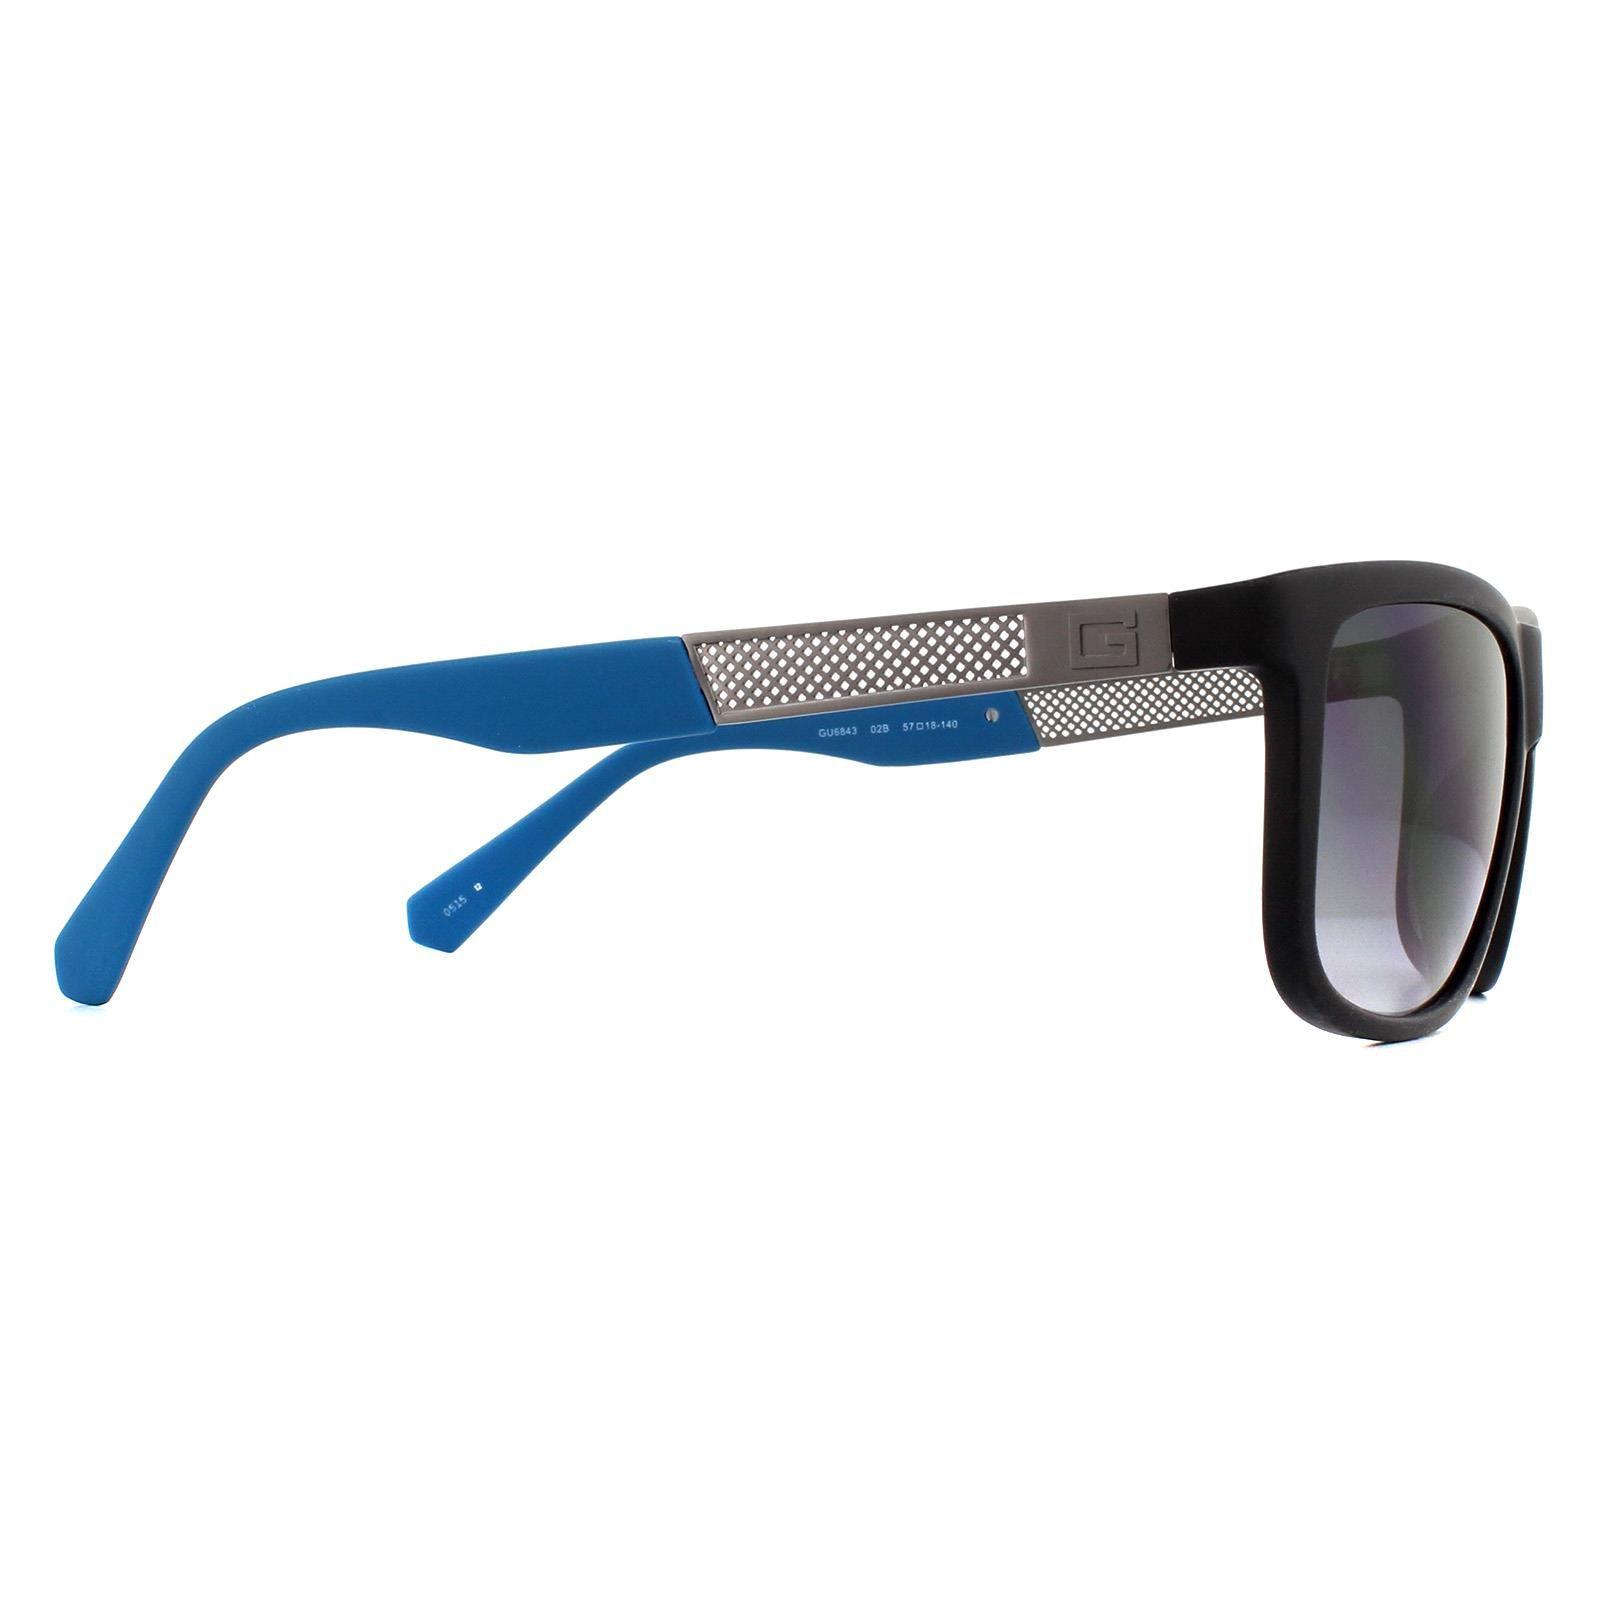 Guess Sunglasses GU6843 02B Matte Black Grey Gradient